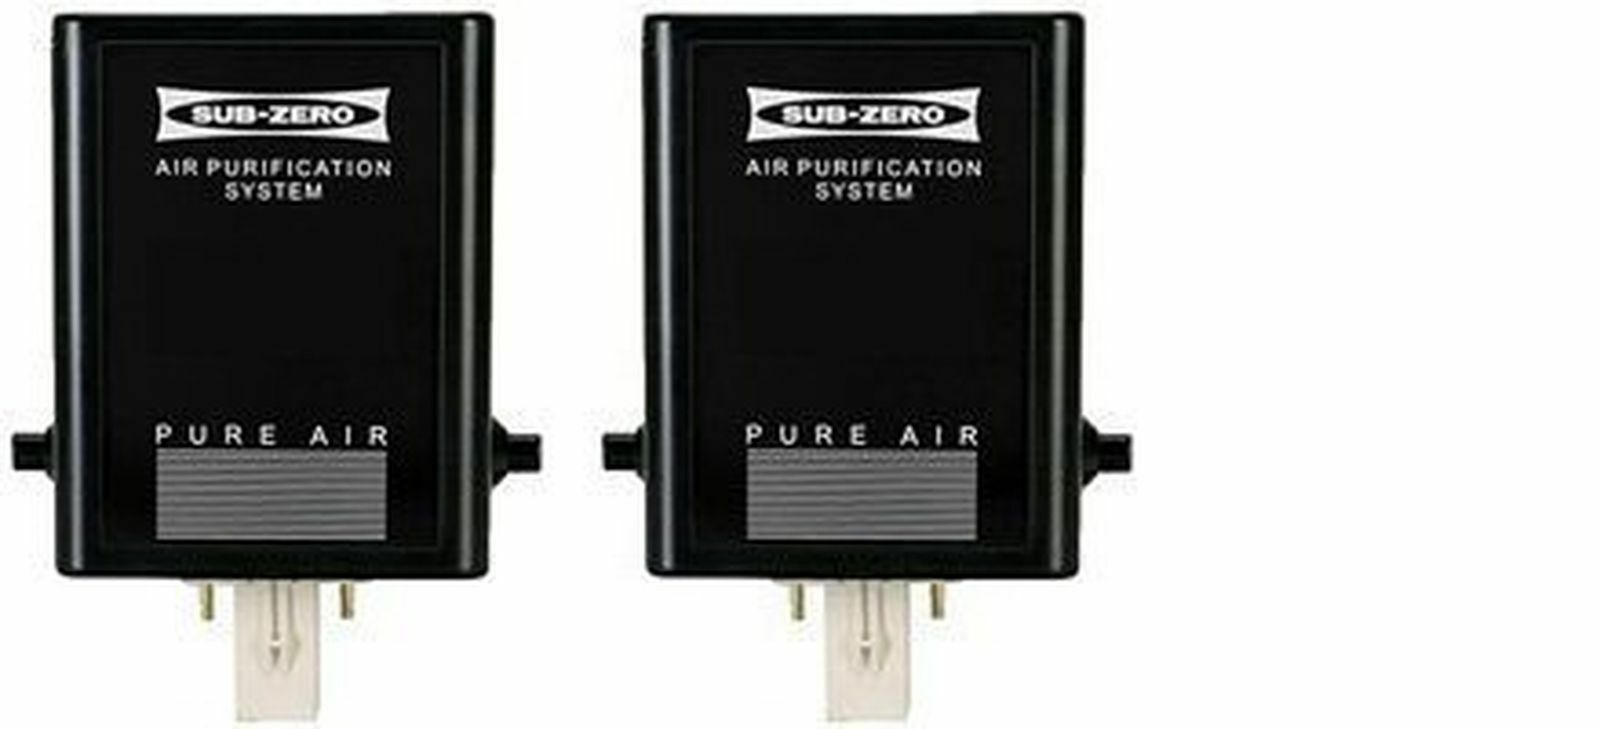 Sub-Zero 7007067 Refrigerator Air Purification Cartridge